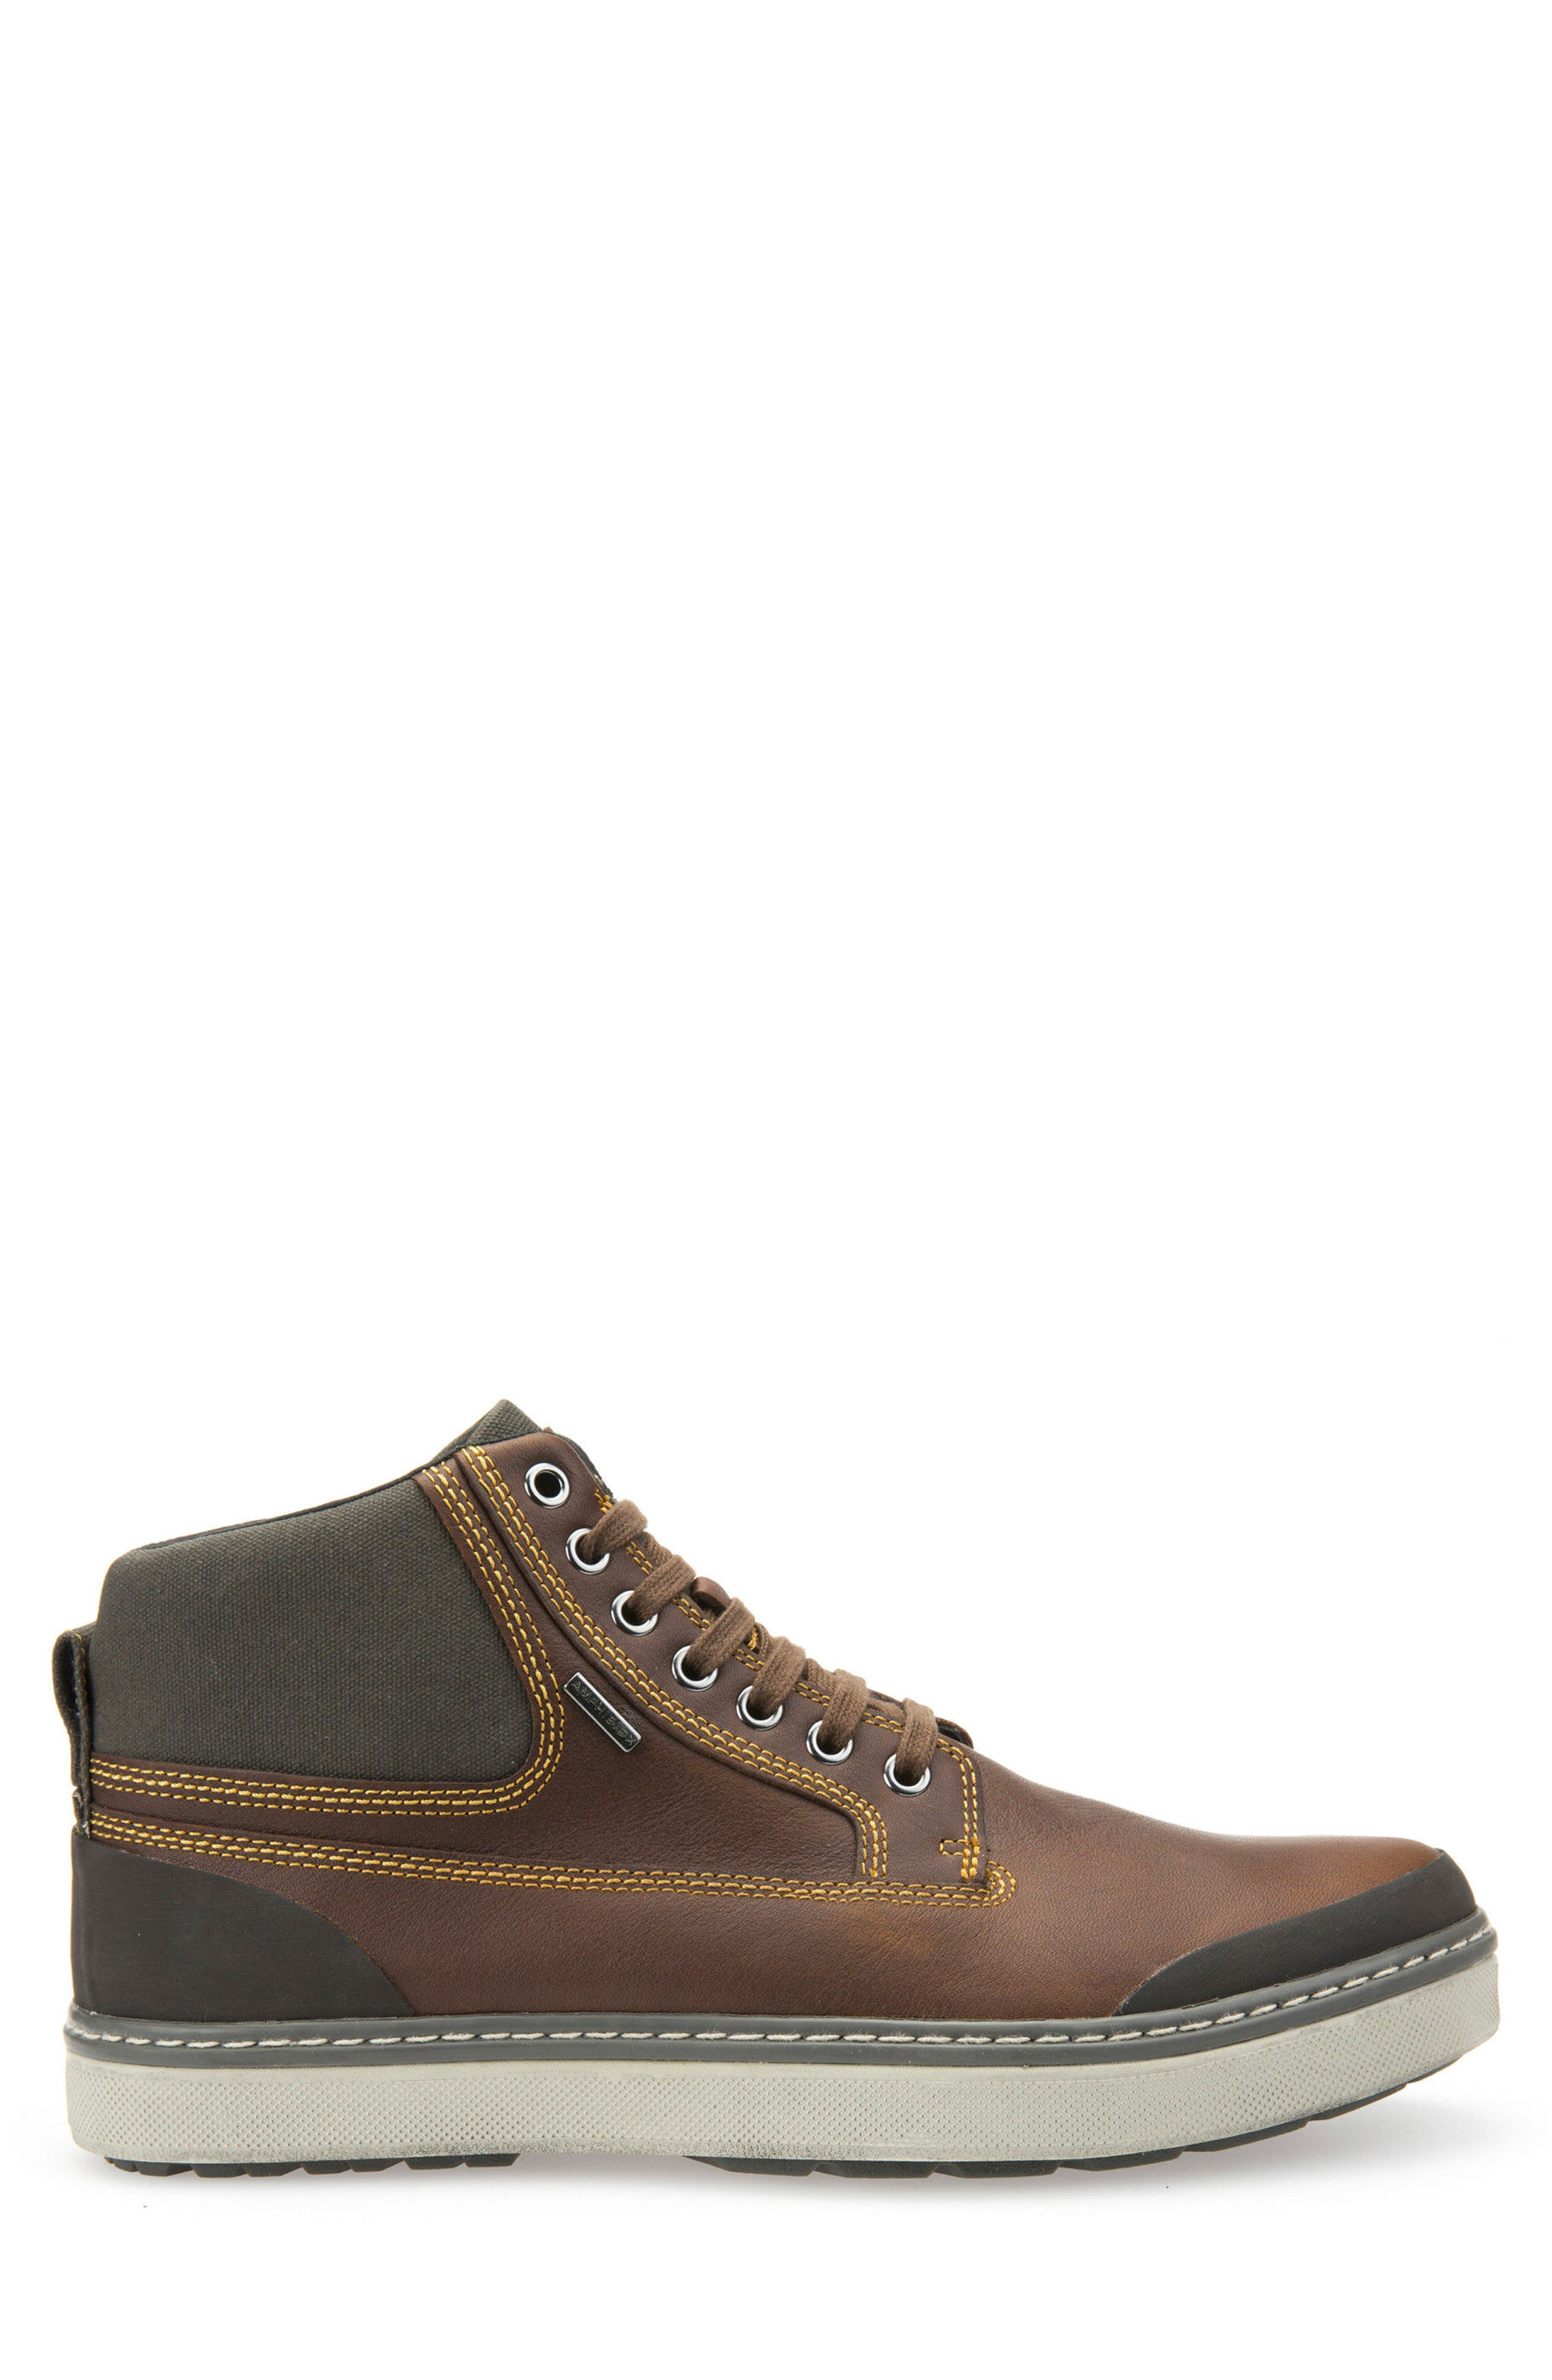 Mattias Amphibiox Waterproof Leather Sneaker,                             Alternate thumbnail 3, color,                             Brown/ Brown